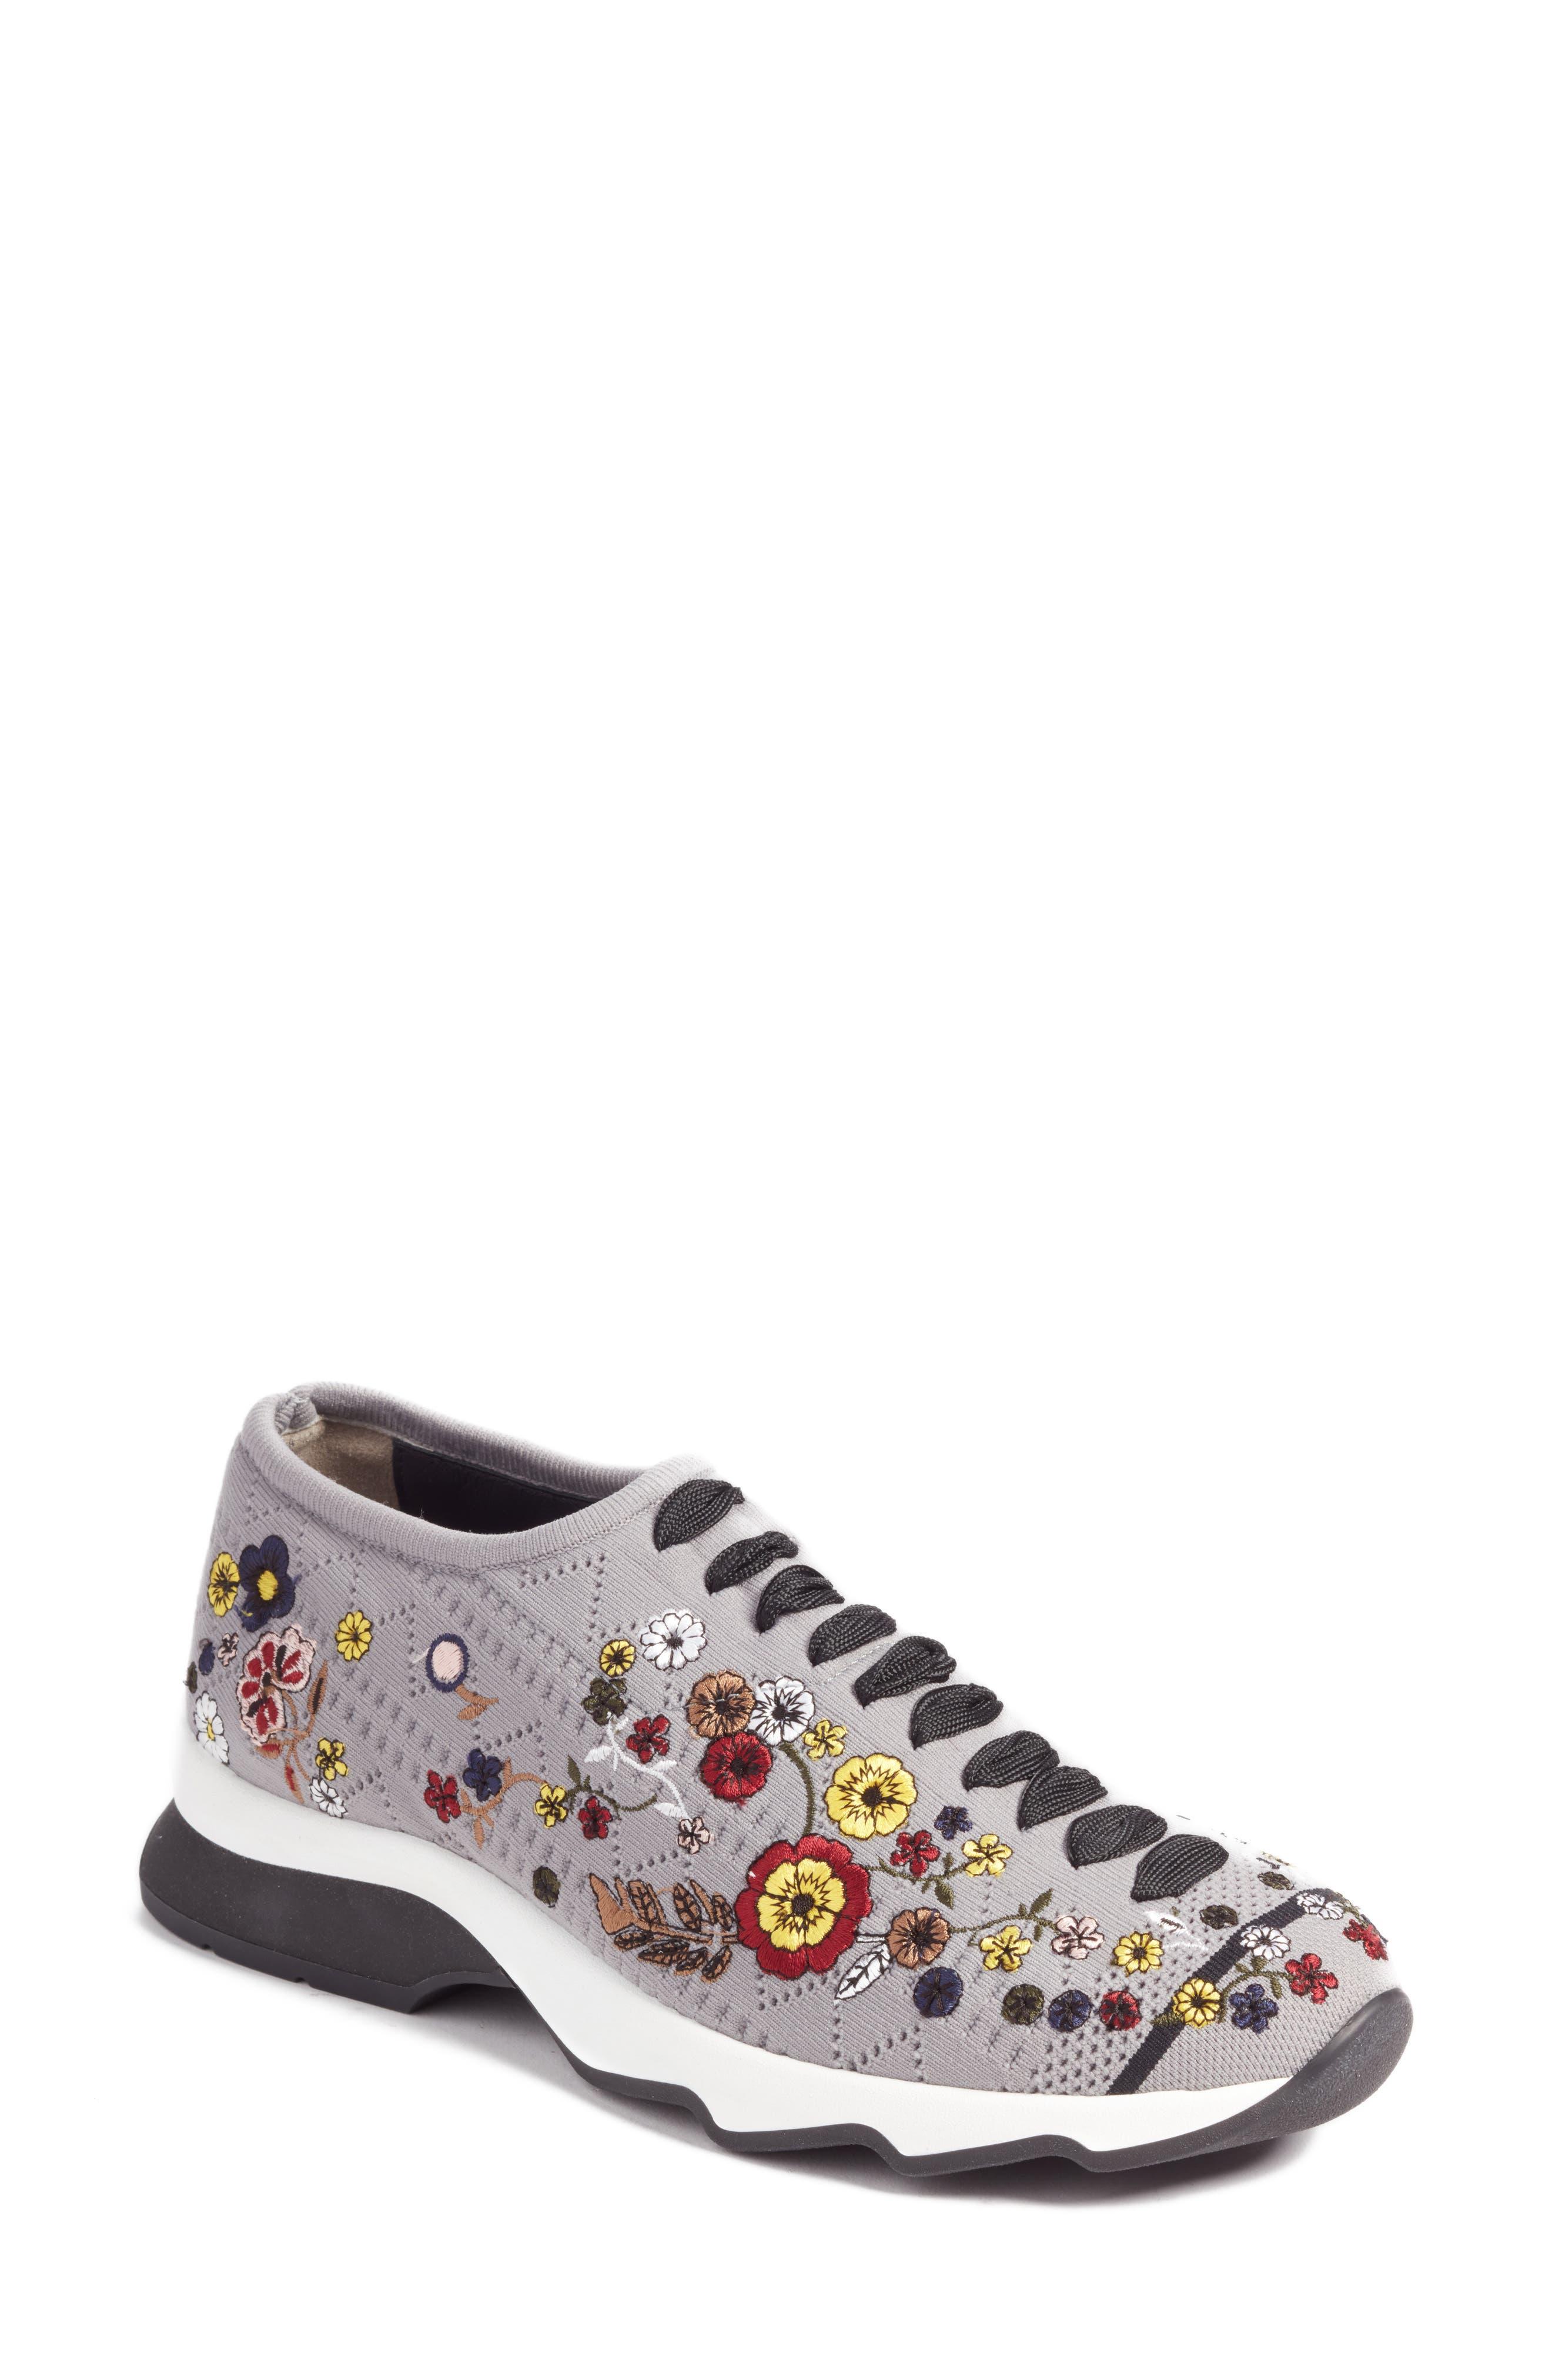 Marie Antoinette Sneaker,                         Main,                         color, 100